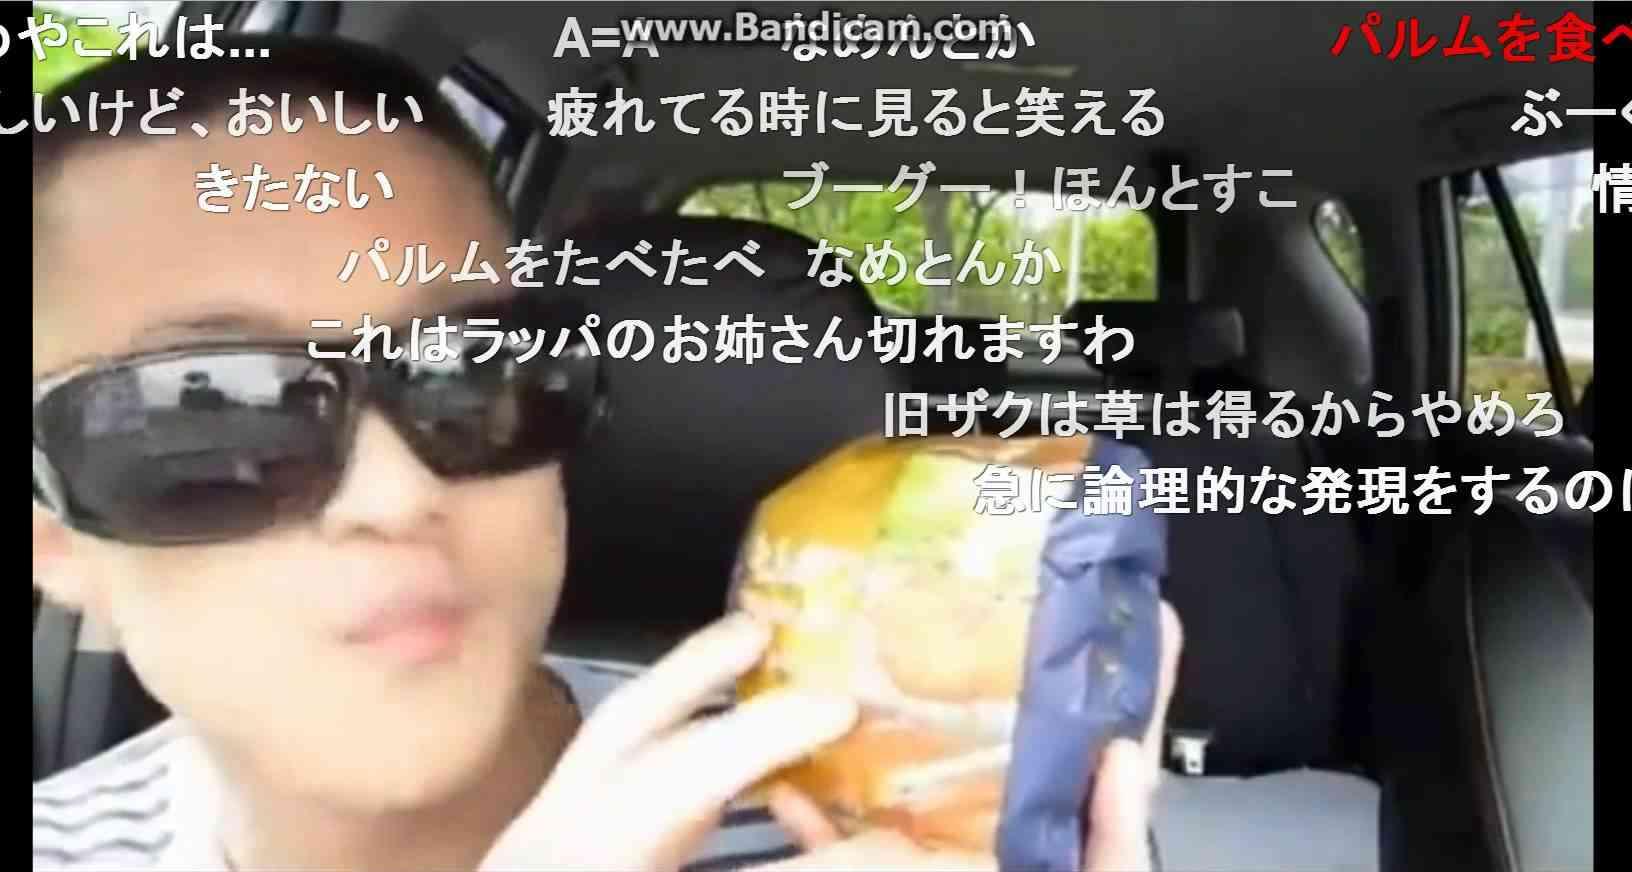 Syamu_game 名場面シーン集【コメ付き】 - YouTube